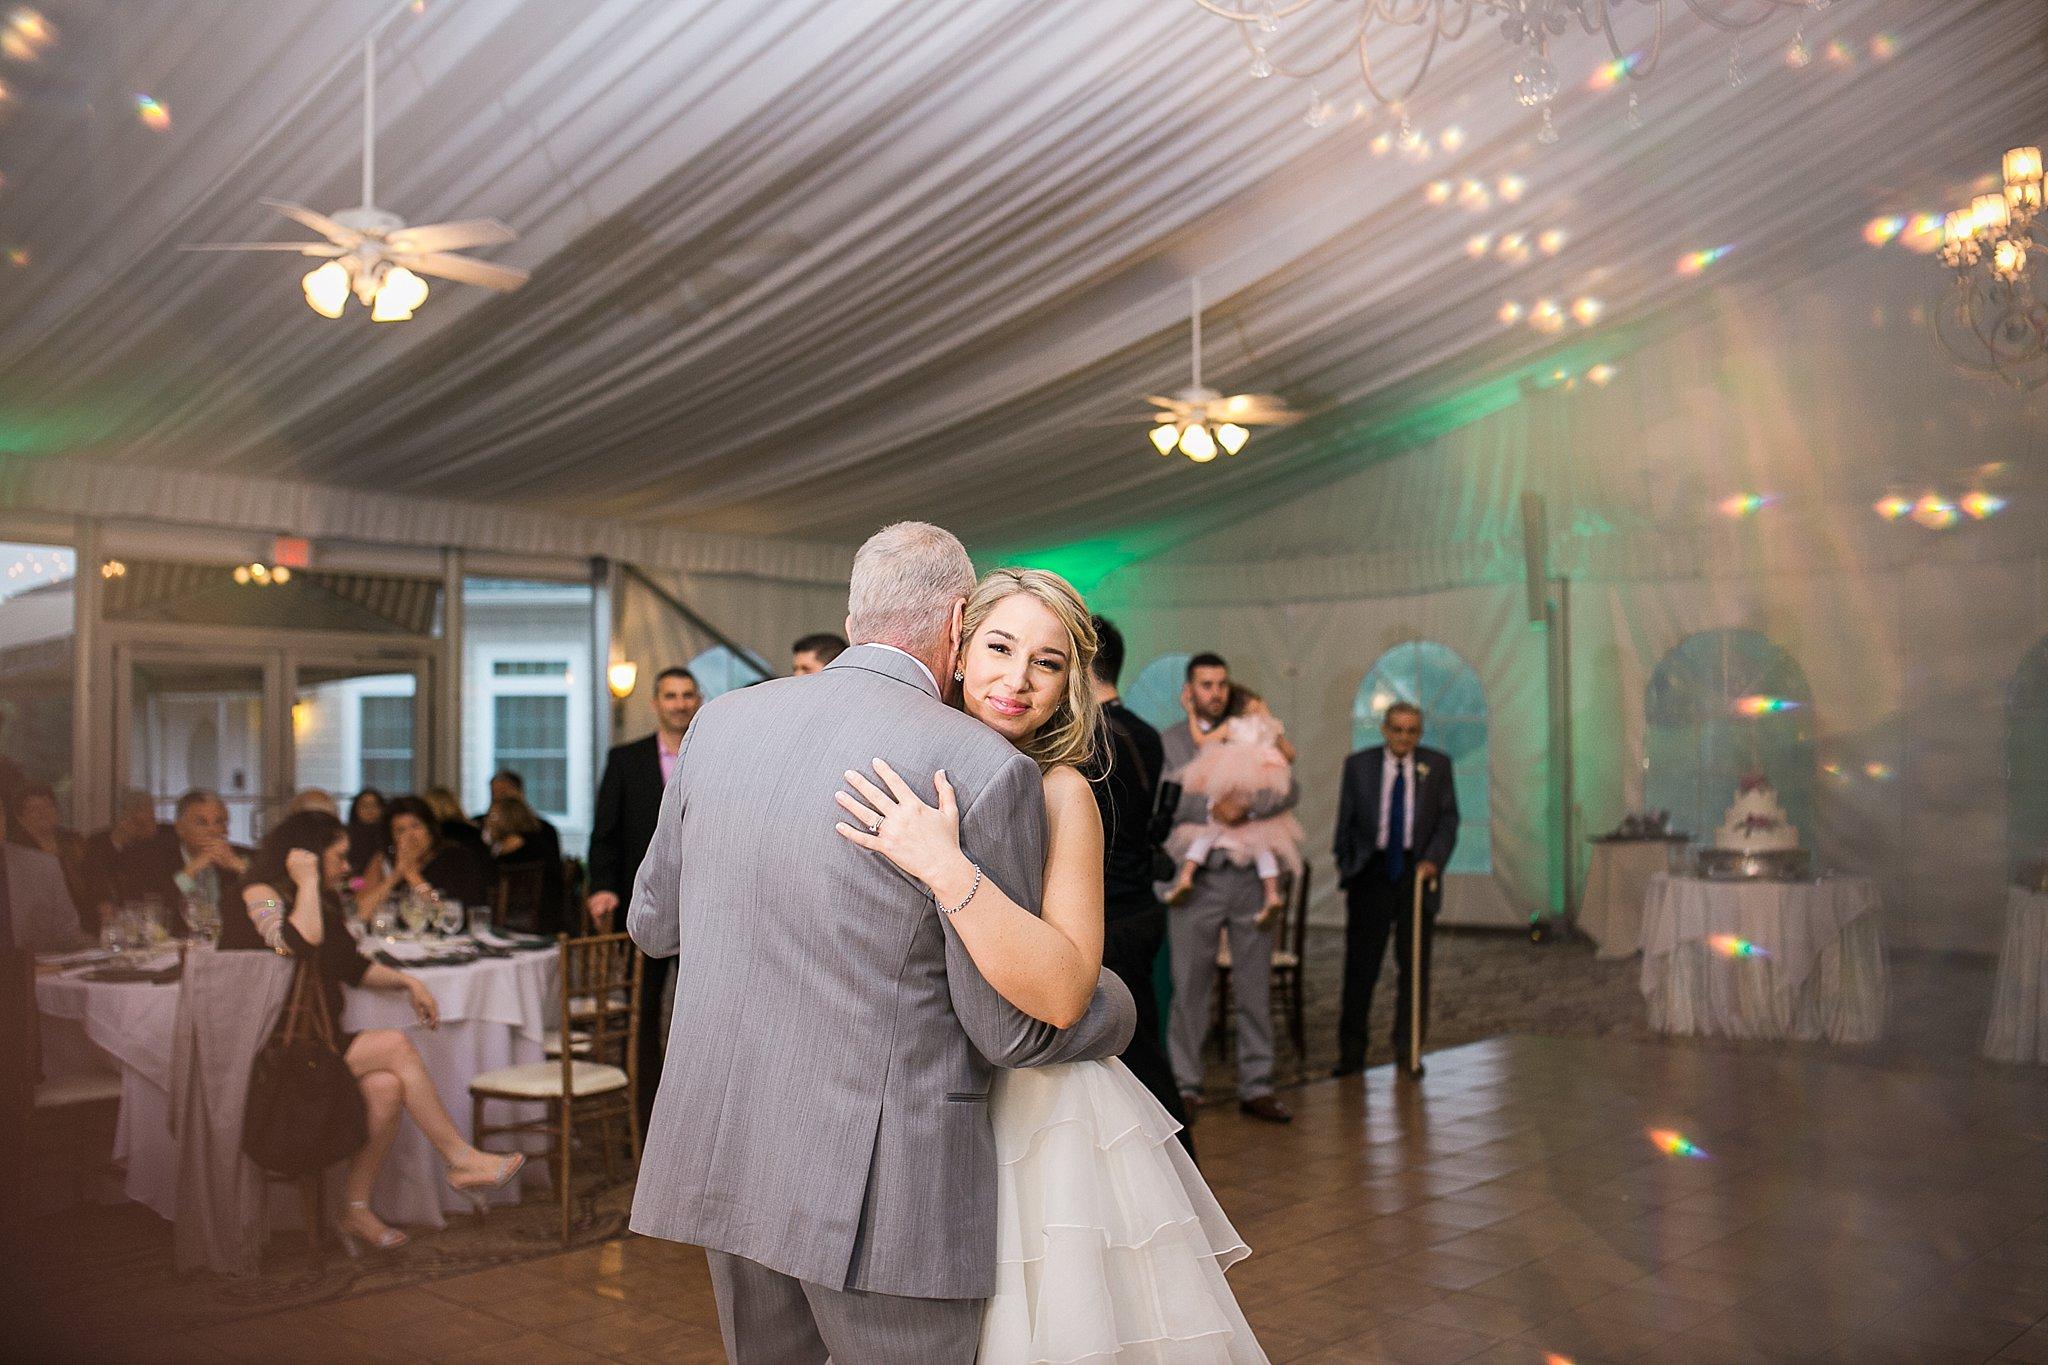 West Hills Country Club Wedding Hudson Valley Wedding Photographer Sweet Alice Photography 129.jpg